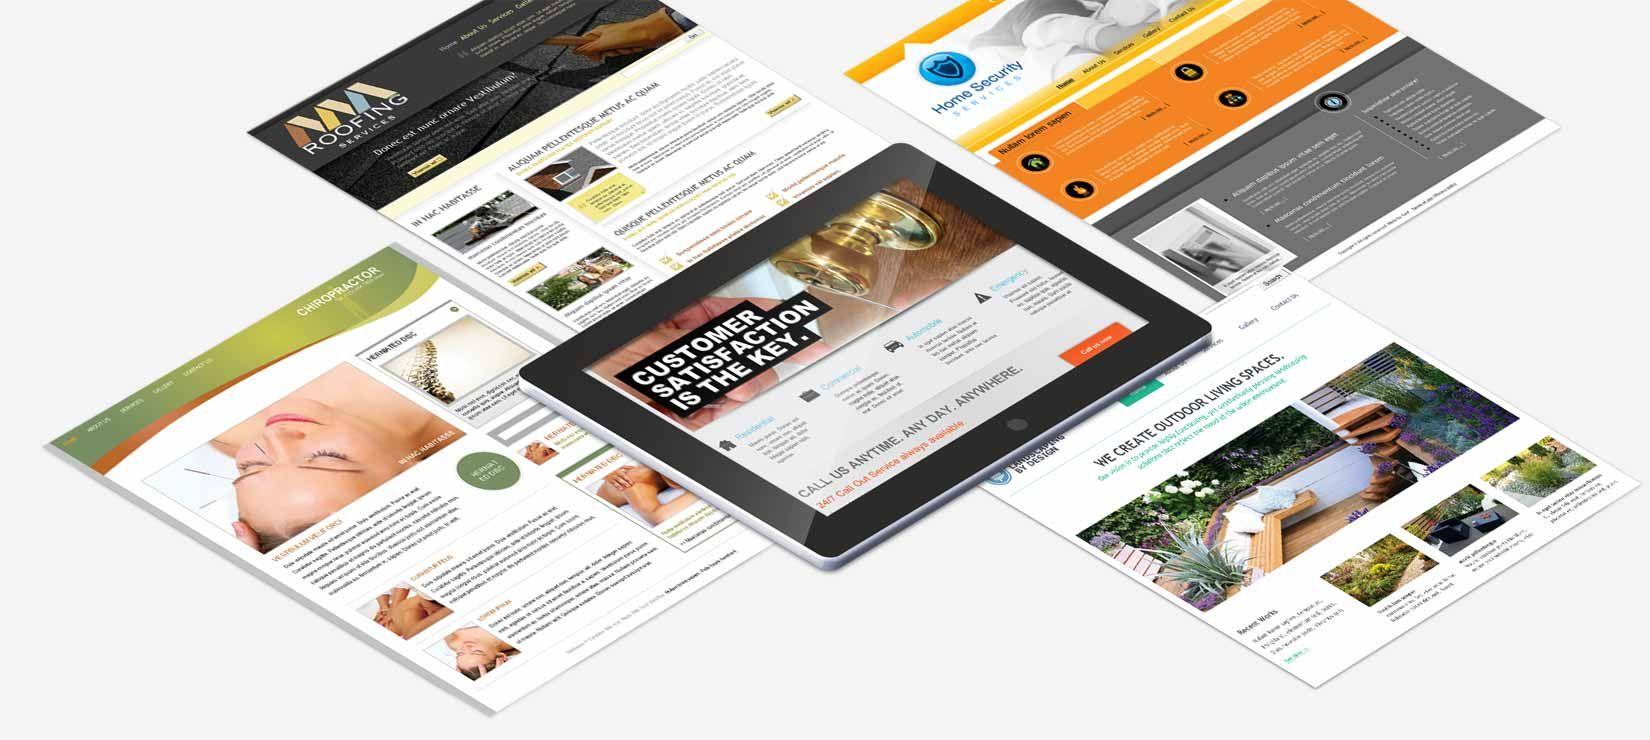 Home Improvement Website Templates Info On Paying For House - Home remodeling website templates